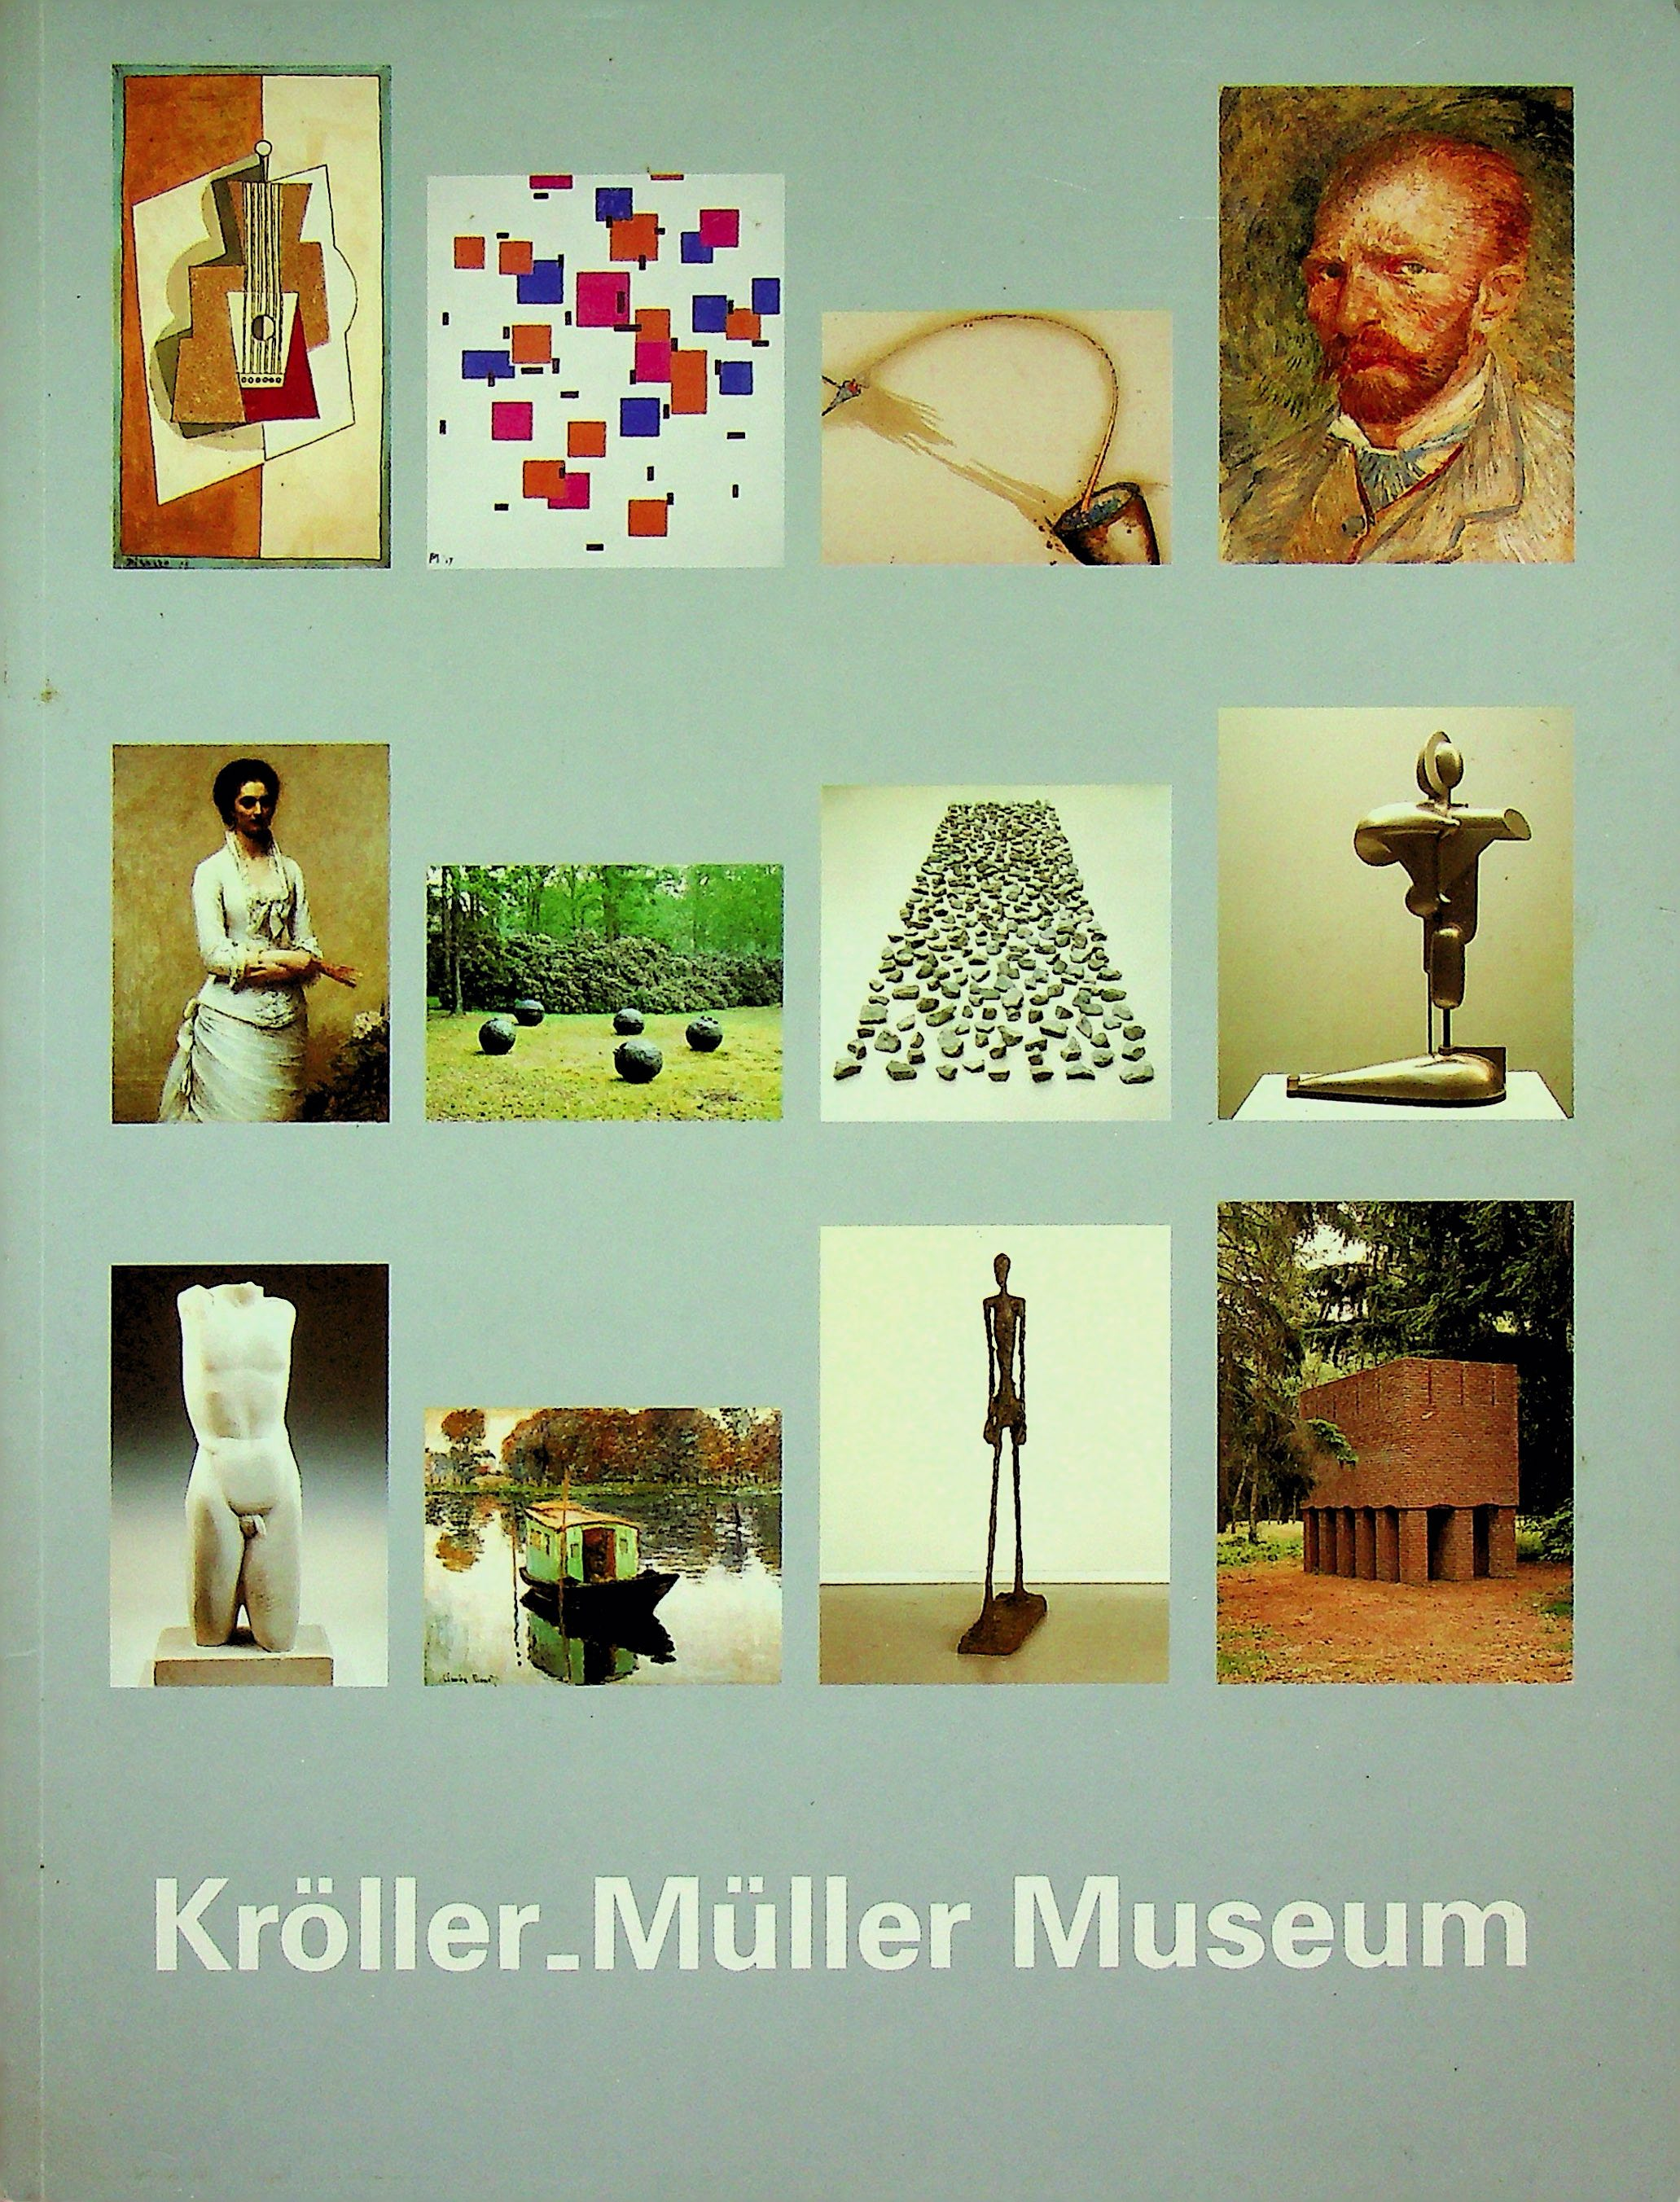 Kroller-Muller Museum - Bremer-Cox, Angeline; Brouns, Rieja